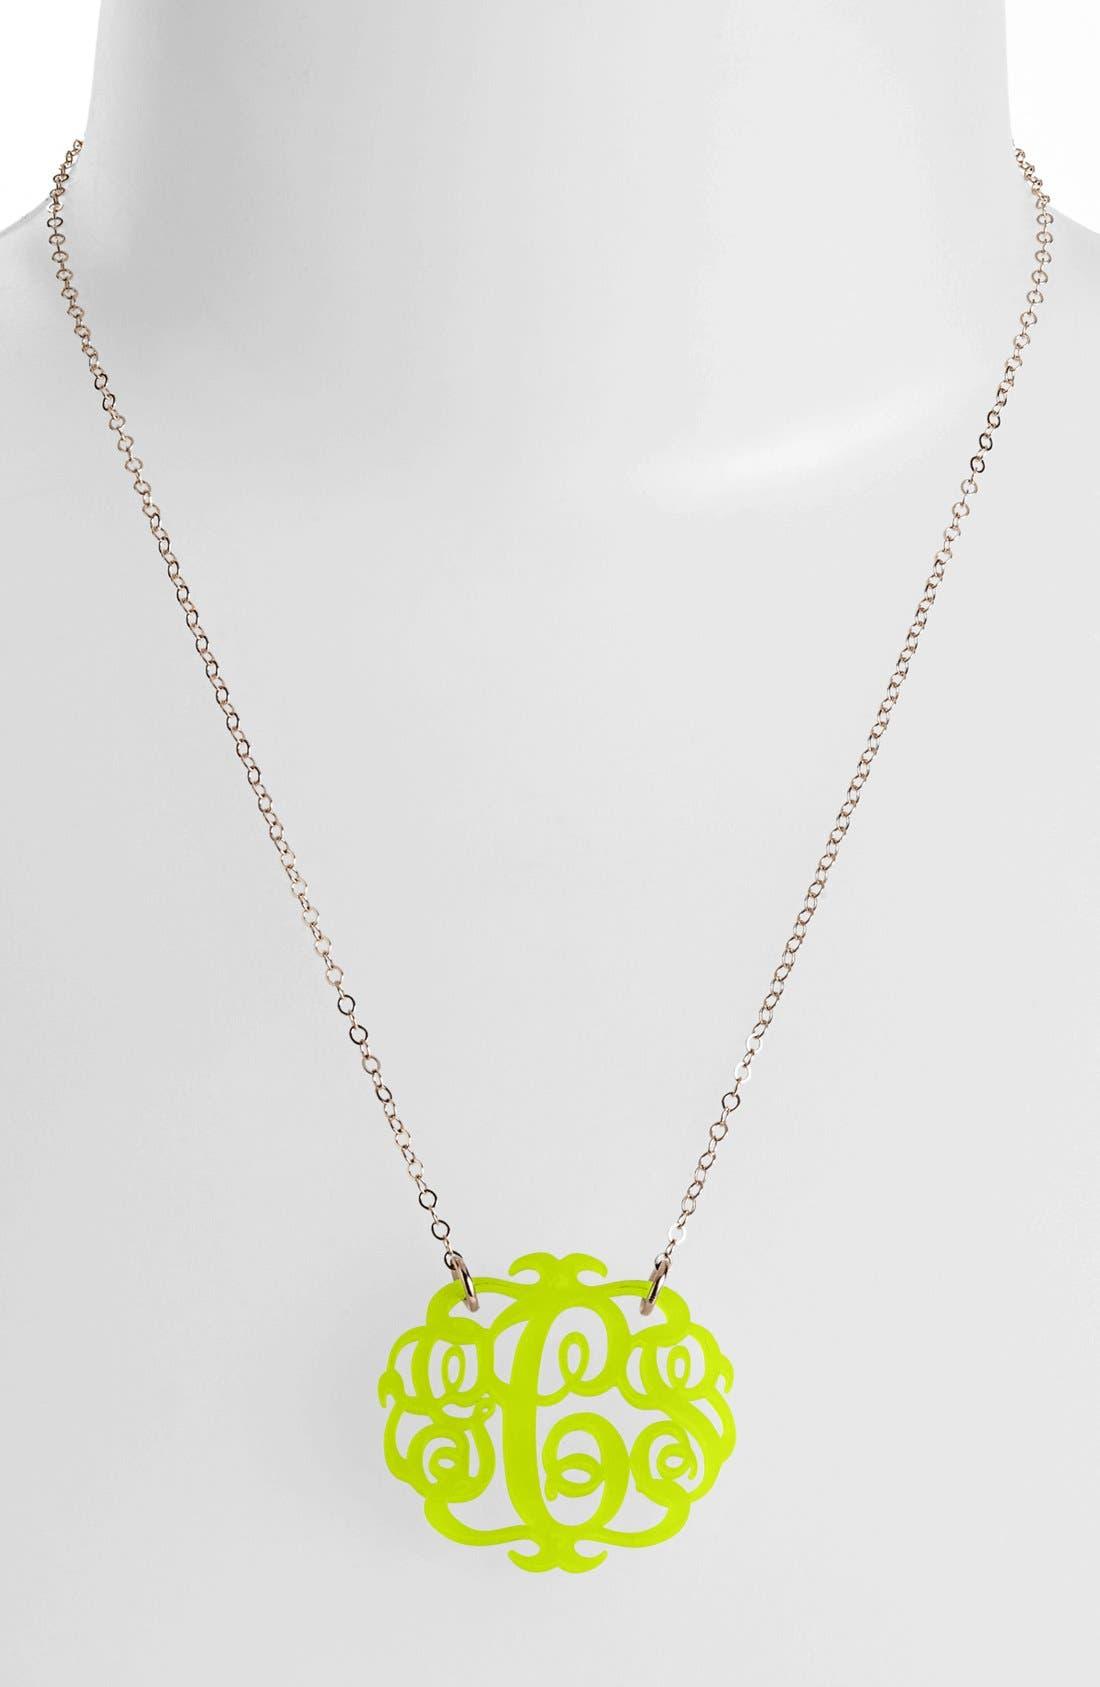 Medium Oval Personalized Monogram Pendant Necklace,                             Main thumbnail 1, color,                             Lime/ Gold